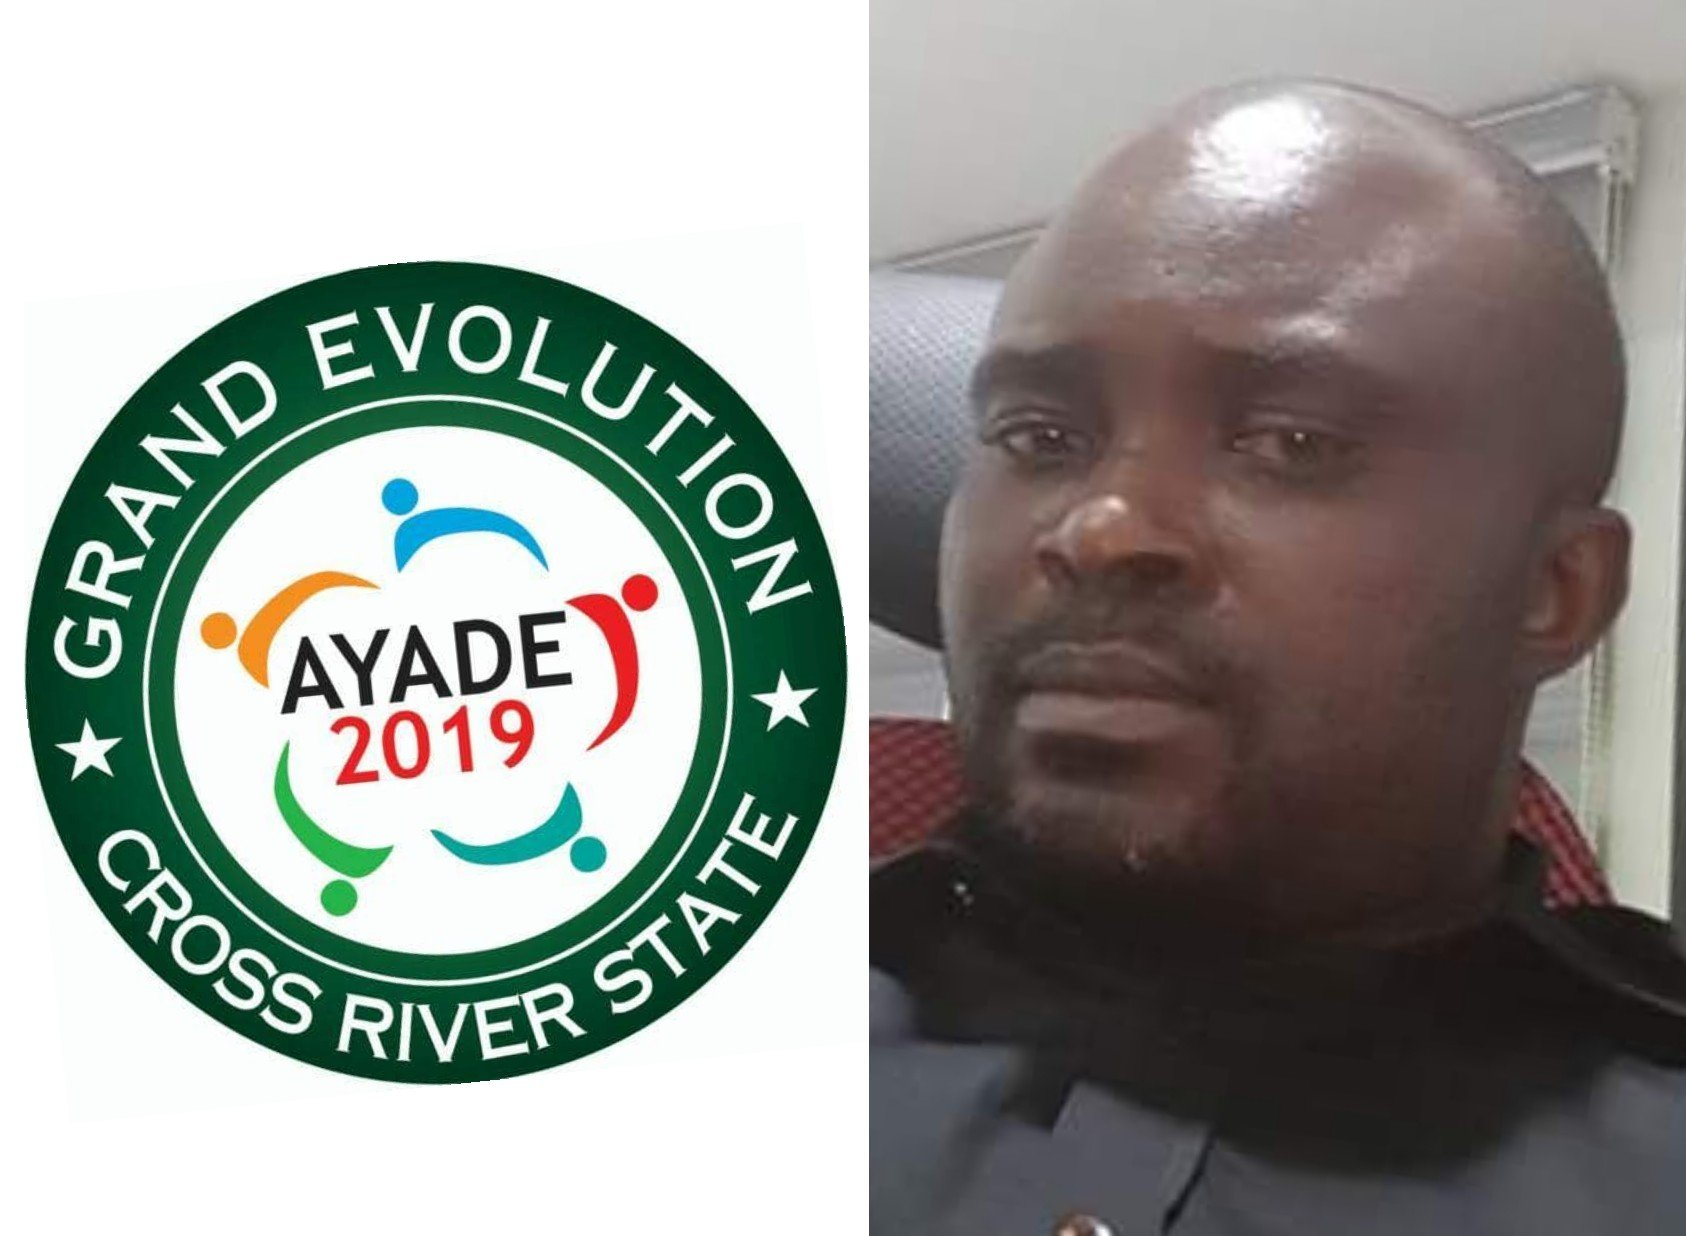 Grand Evolution Congratulates Ayade, Sues For Understanding